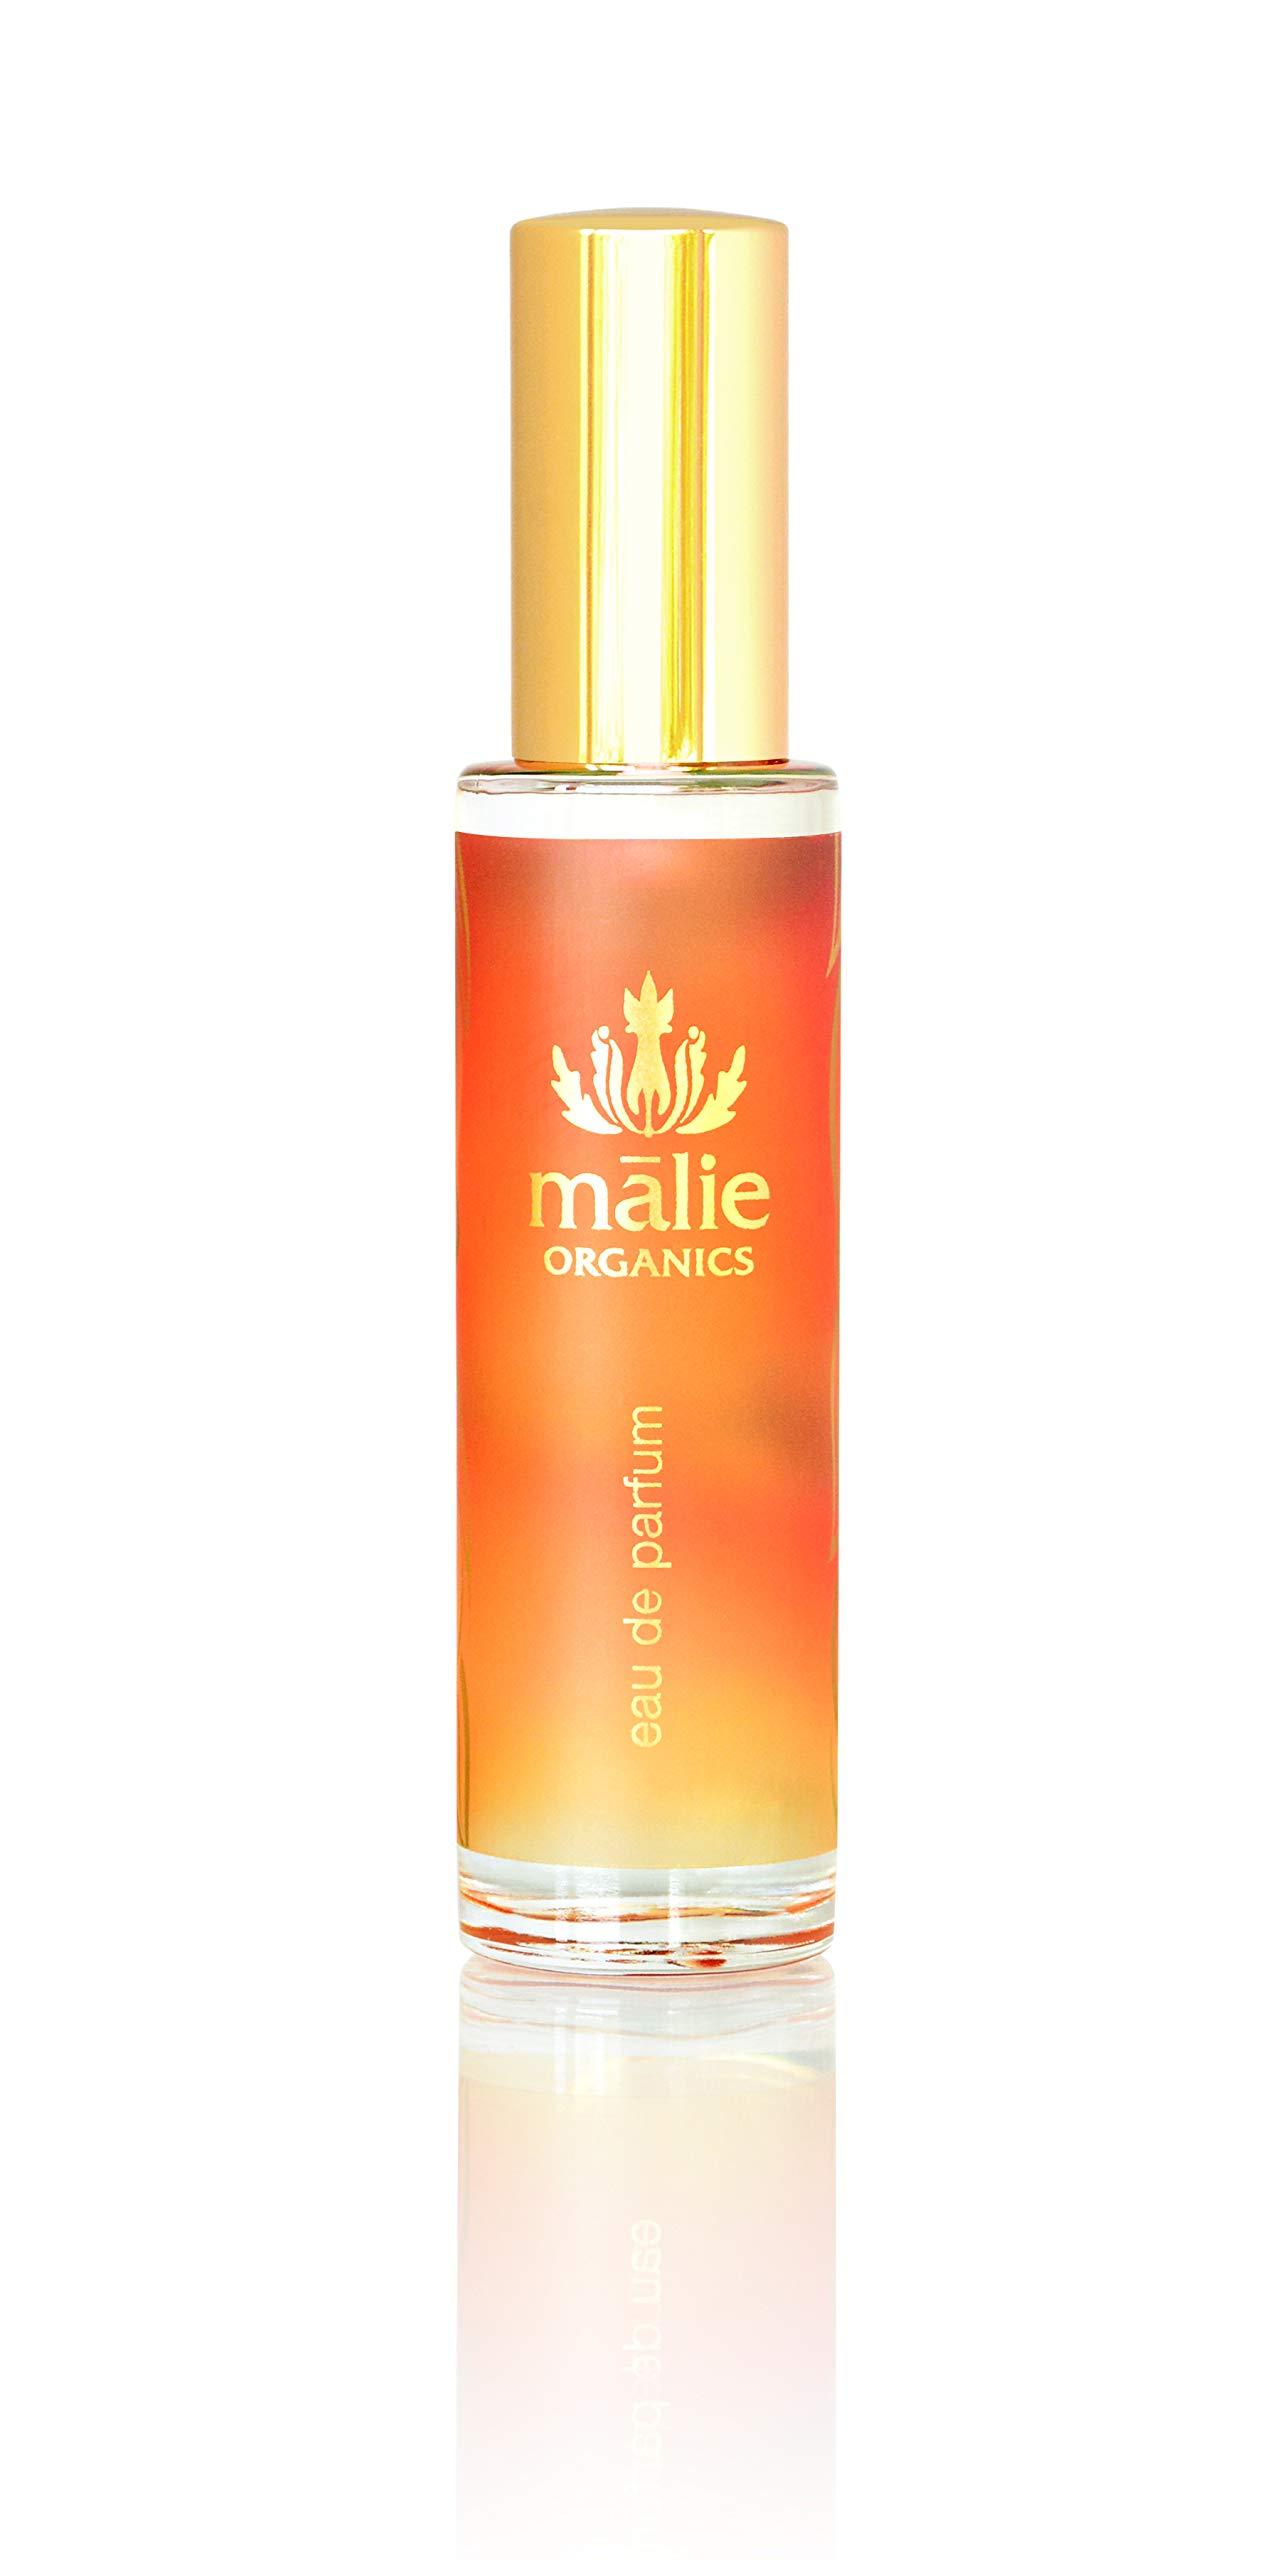 Malie Organics Eau de Parfum - Mango Nectar